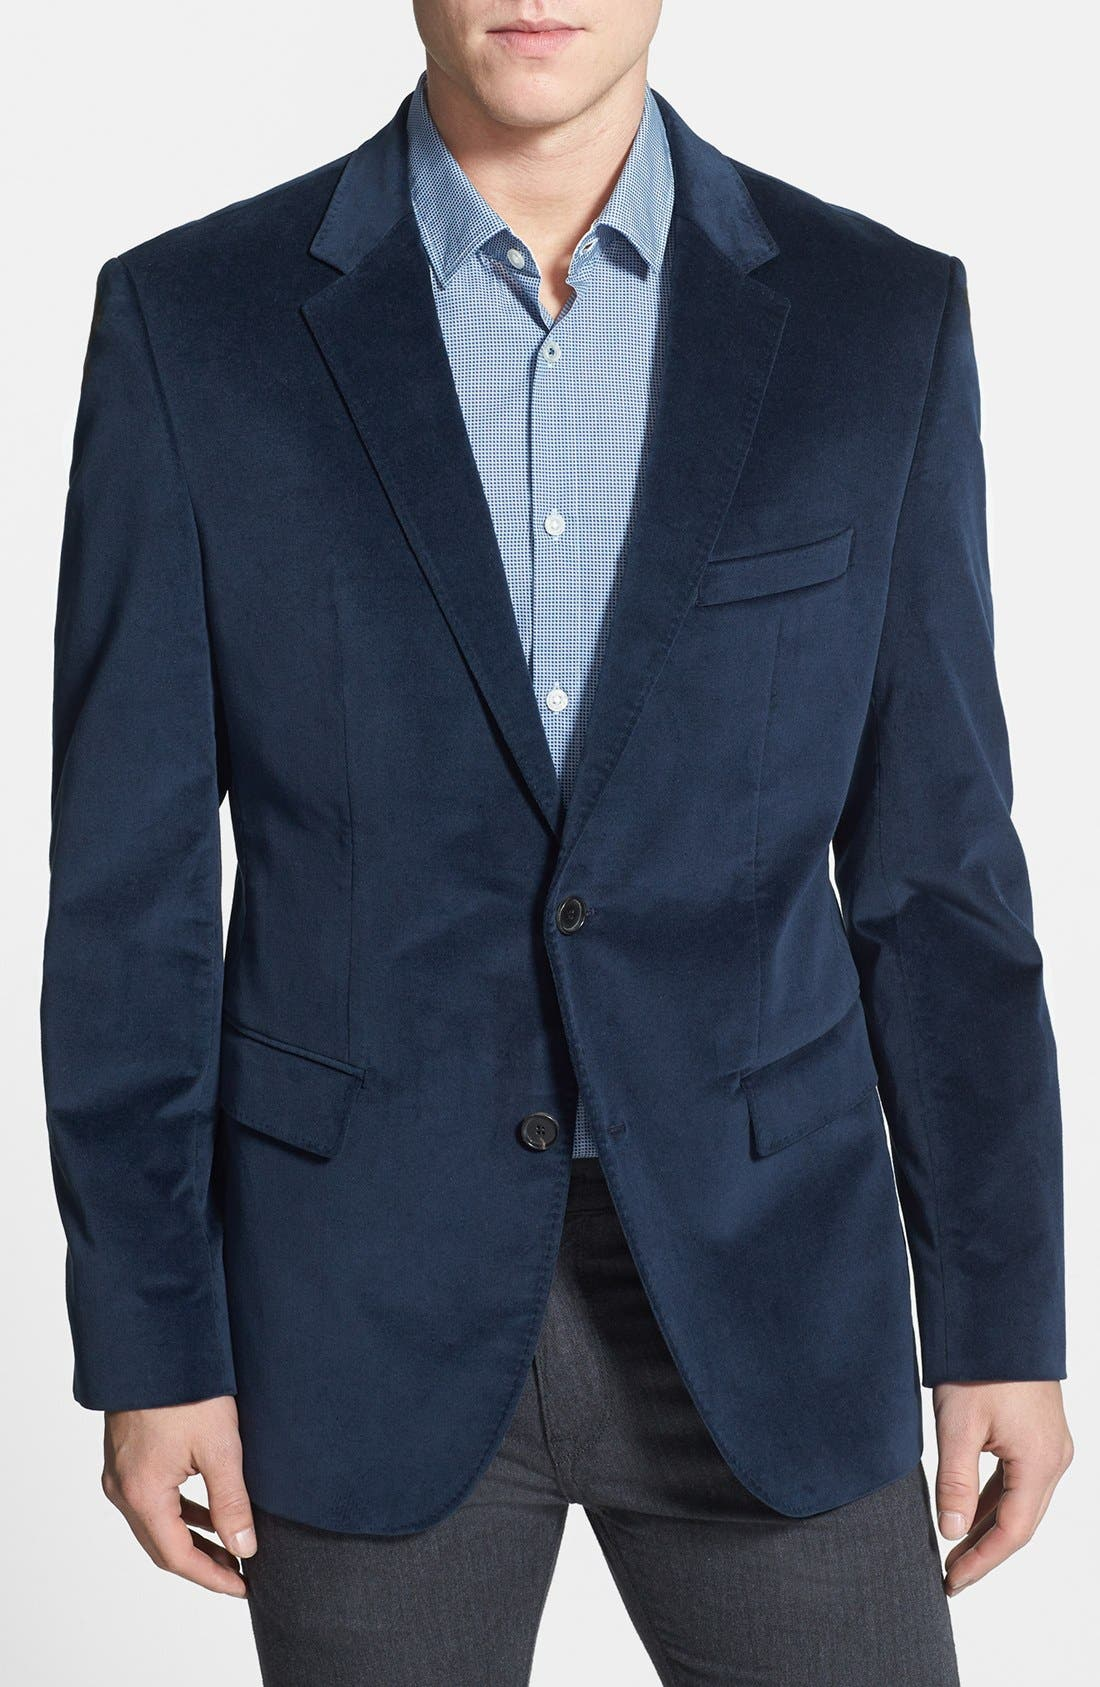 Main Image - BOSS HUGO BOSS 'The Coast Us' Stretch Cotton Sportcoat